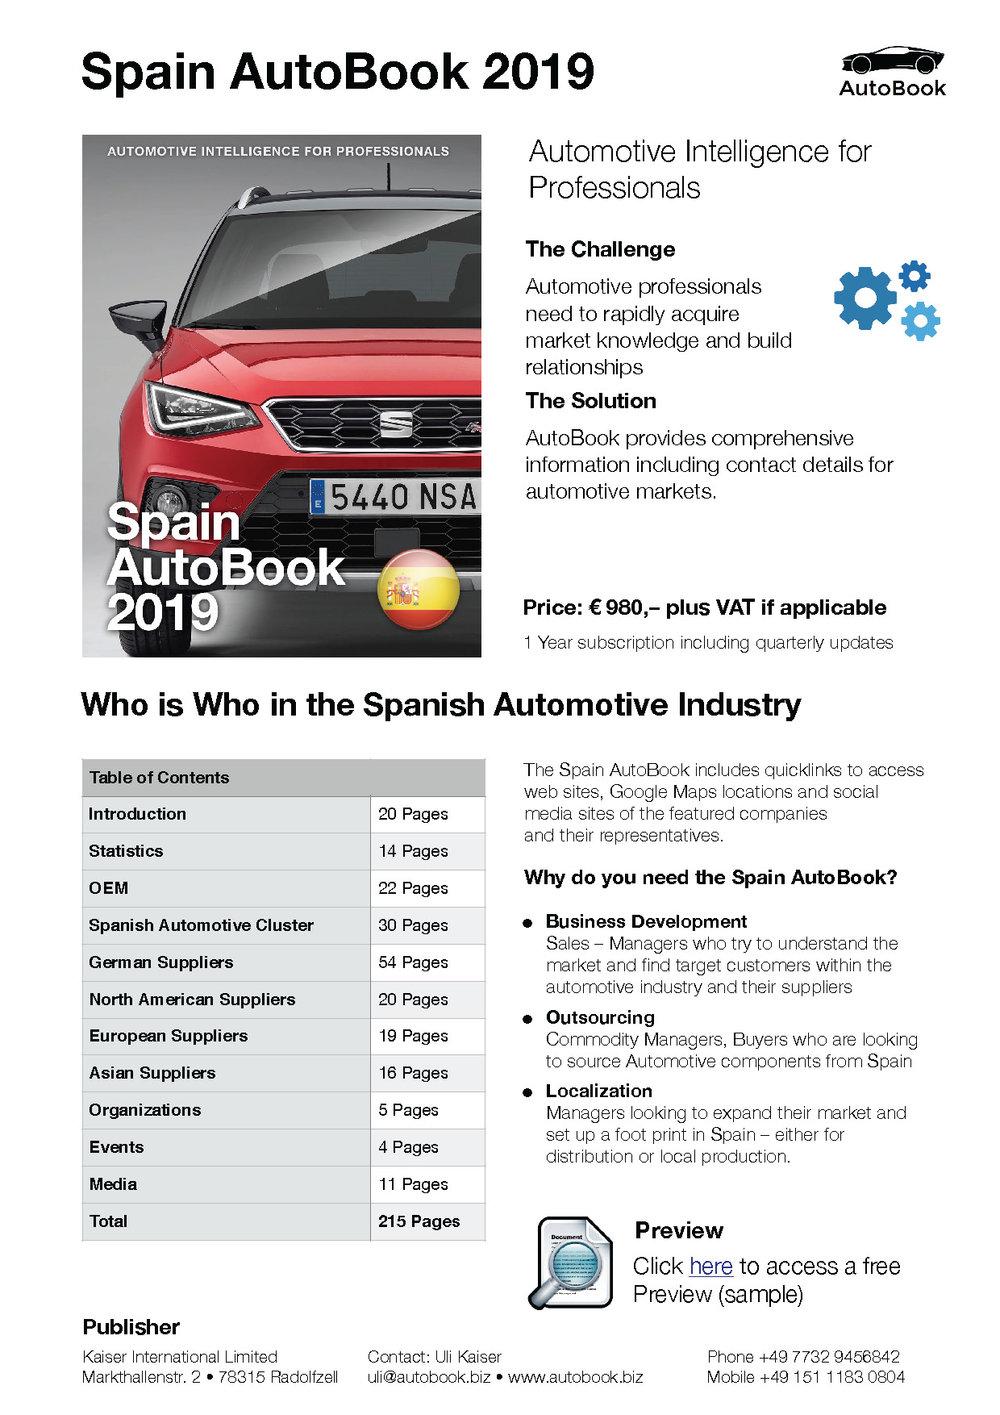 Spain AutoBook 2019 Datasheet.jpg